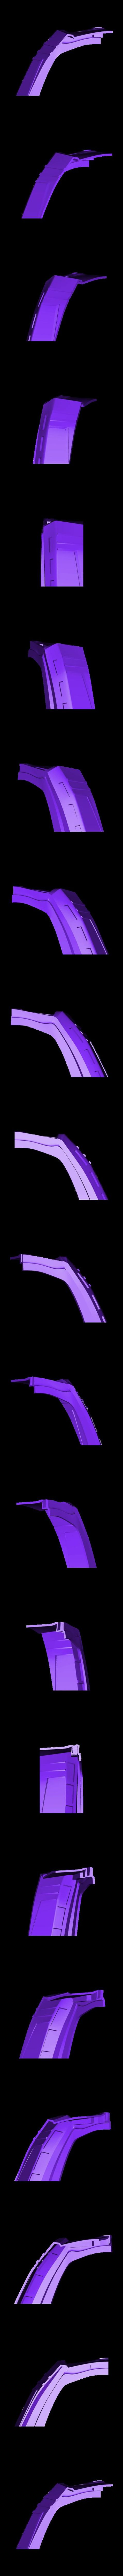 Part_9_v2.stl Download free STL file Battlestar Galactica Colonial Viper Pilot Helmet • 3D printing object, VillainousPropShop